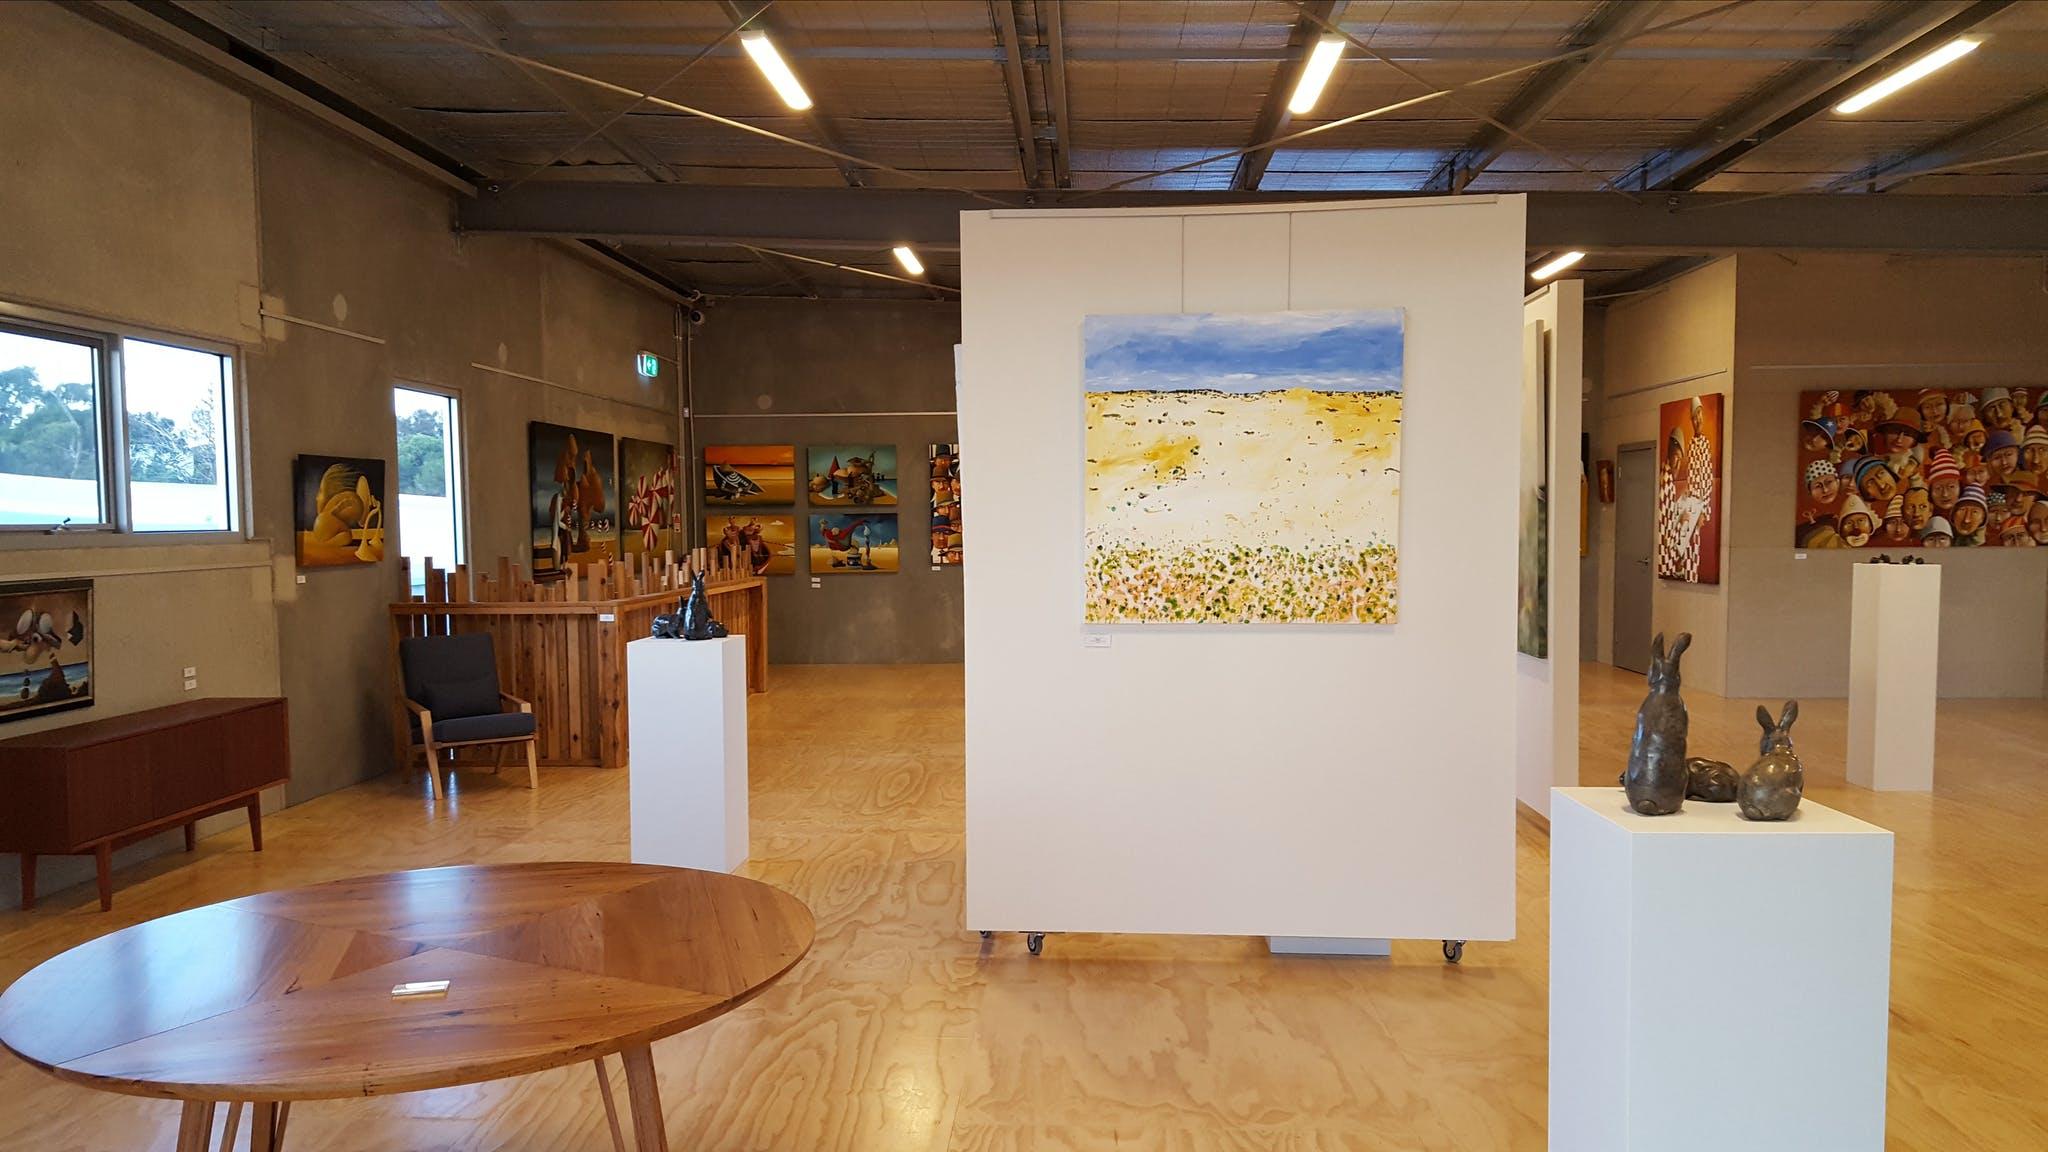 The Hive Gallery Ocean Grove Attraction Geelong the Bellarine